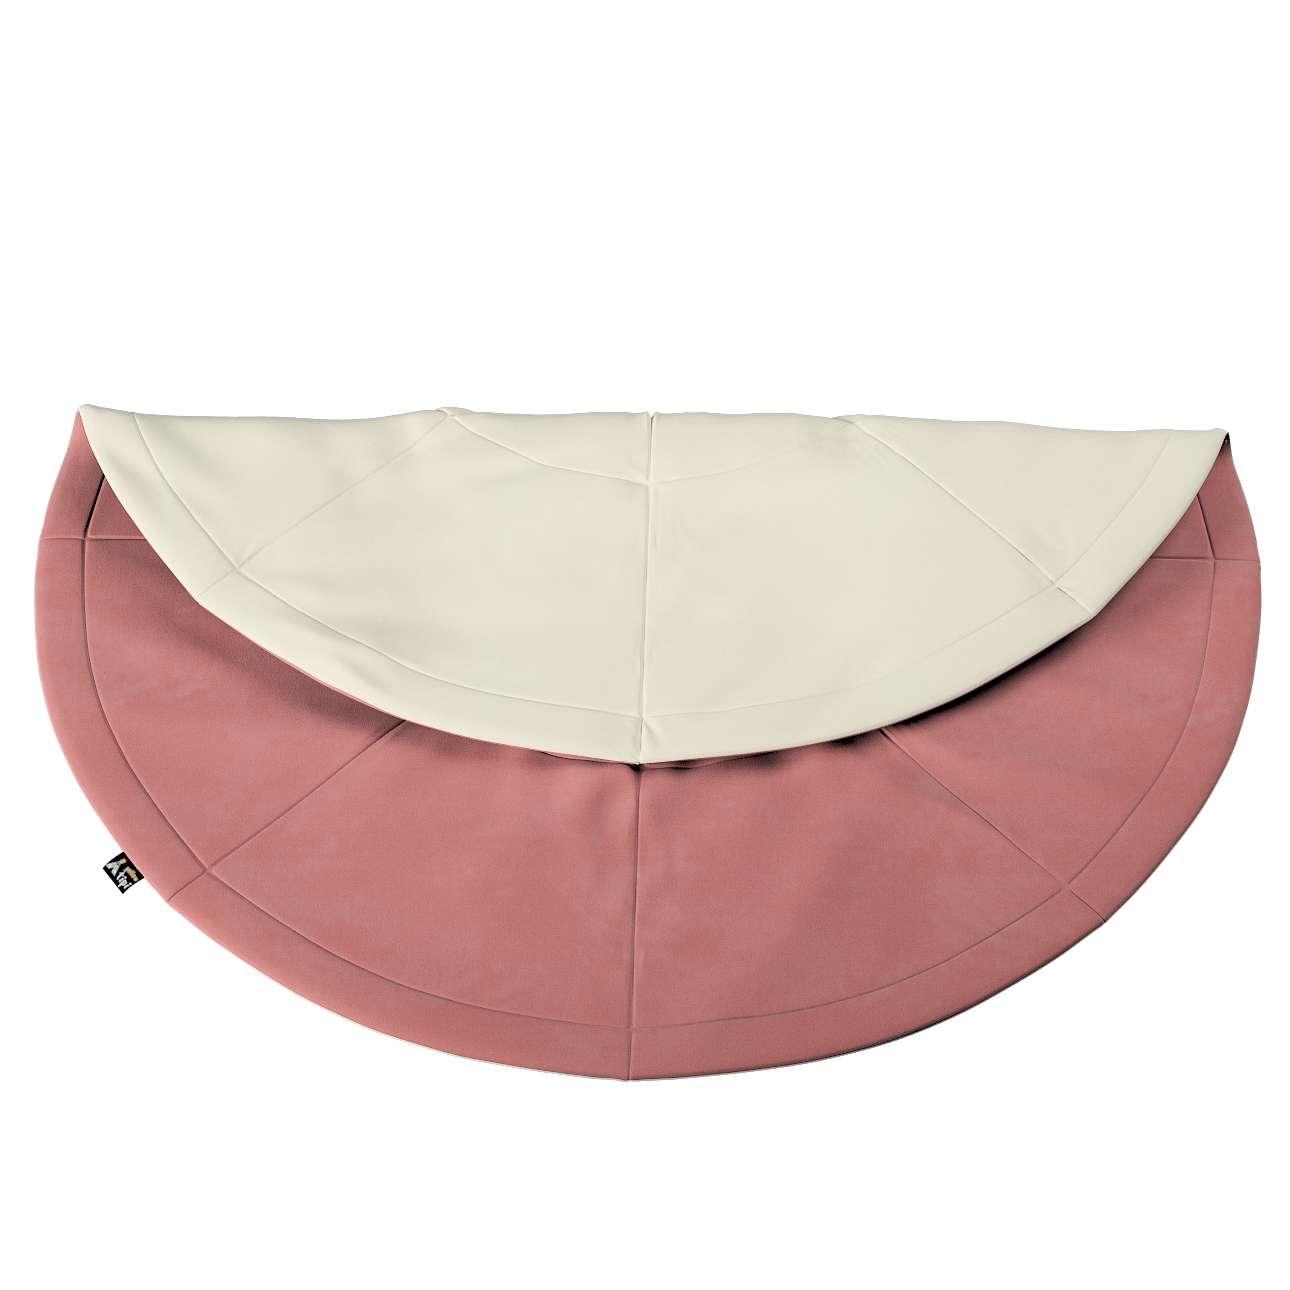 Round mat in collection Posh Velvet, fabric: 704-30